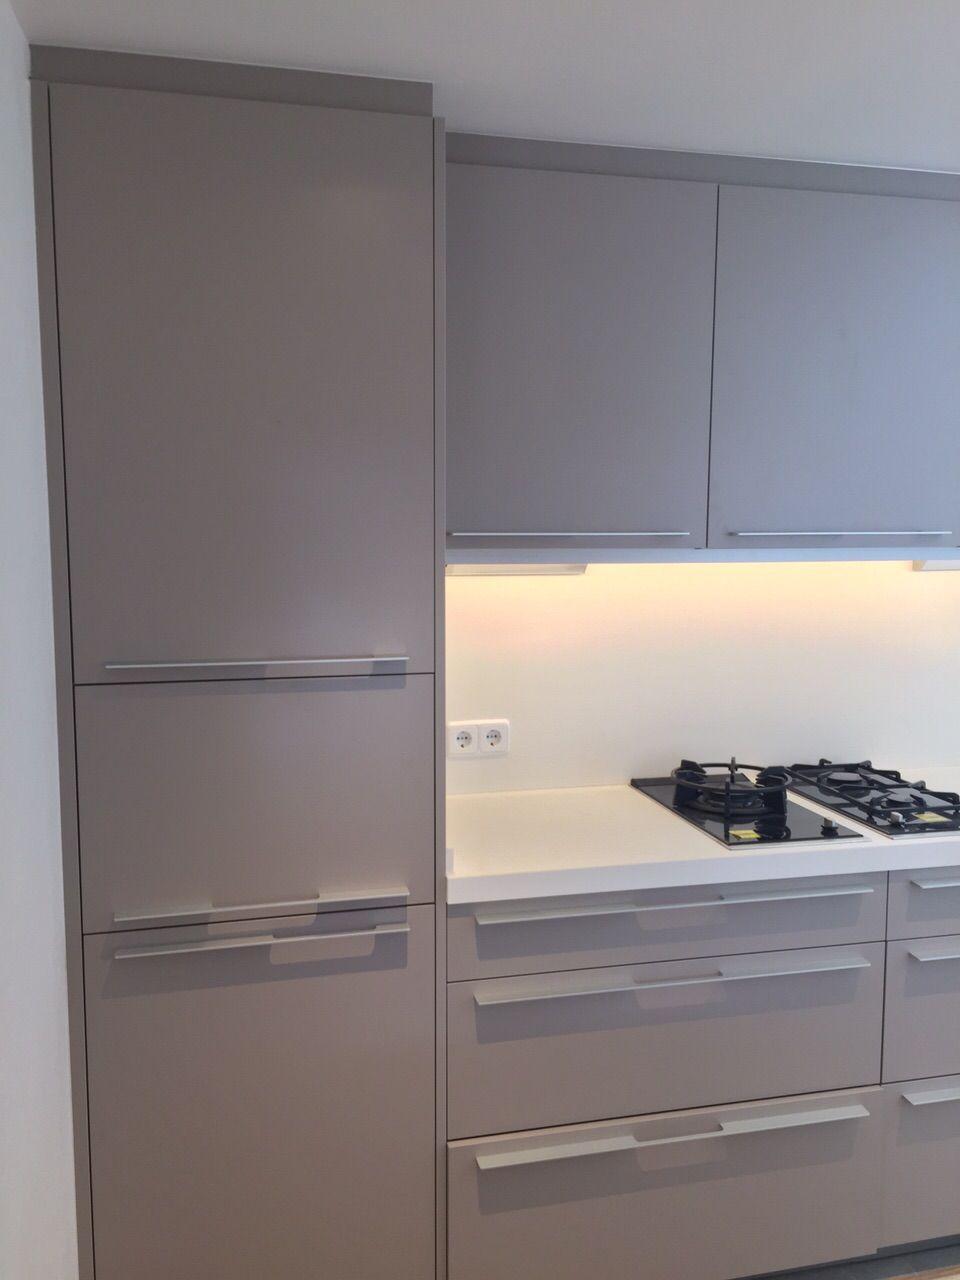 Cocina Santos Modelo Seda En Acabado Gris Arena 252 Con Tirador  # Muebles Seda Murcia